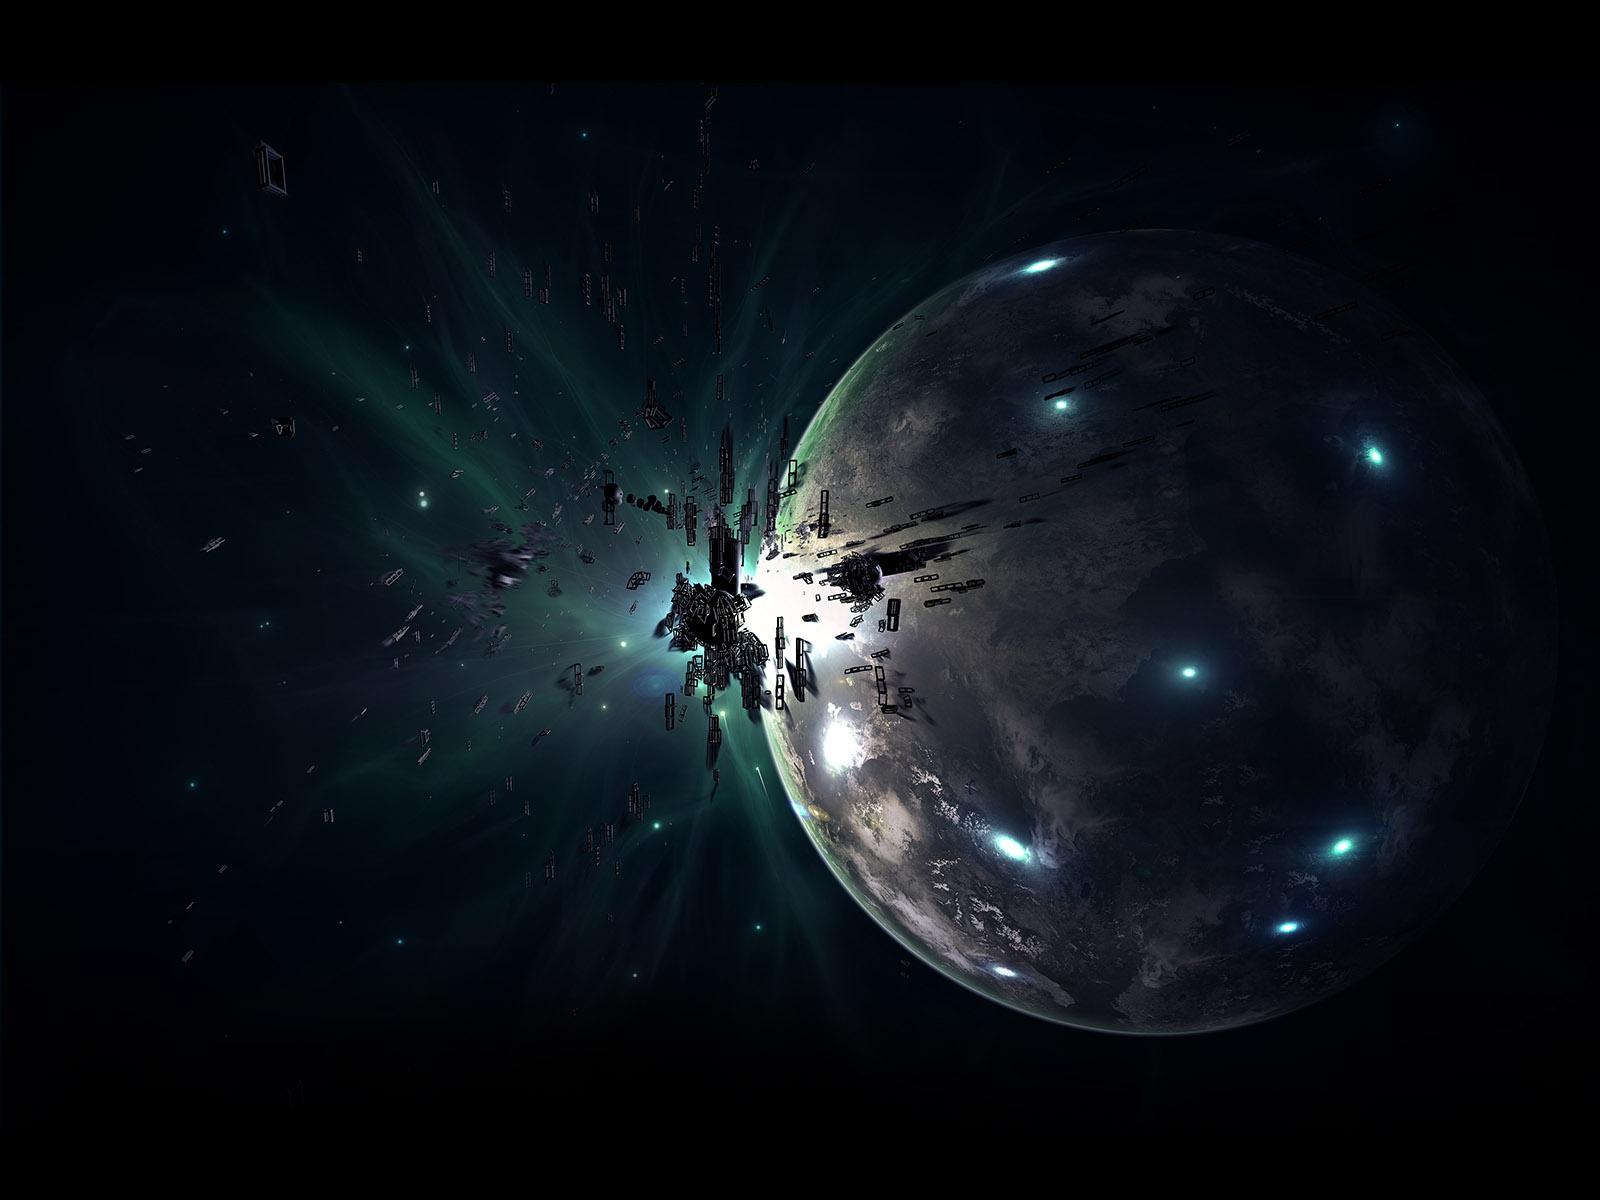 Digital Universe 12   Space Photography Desktop Wallpapers 1132 1600x1200